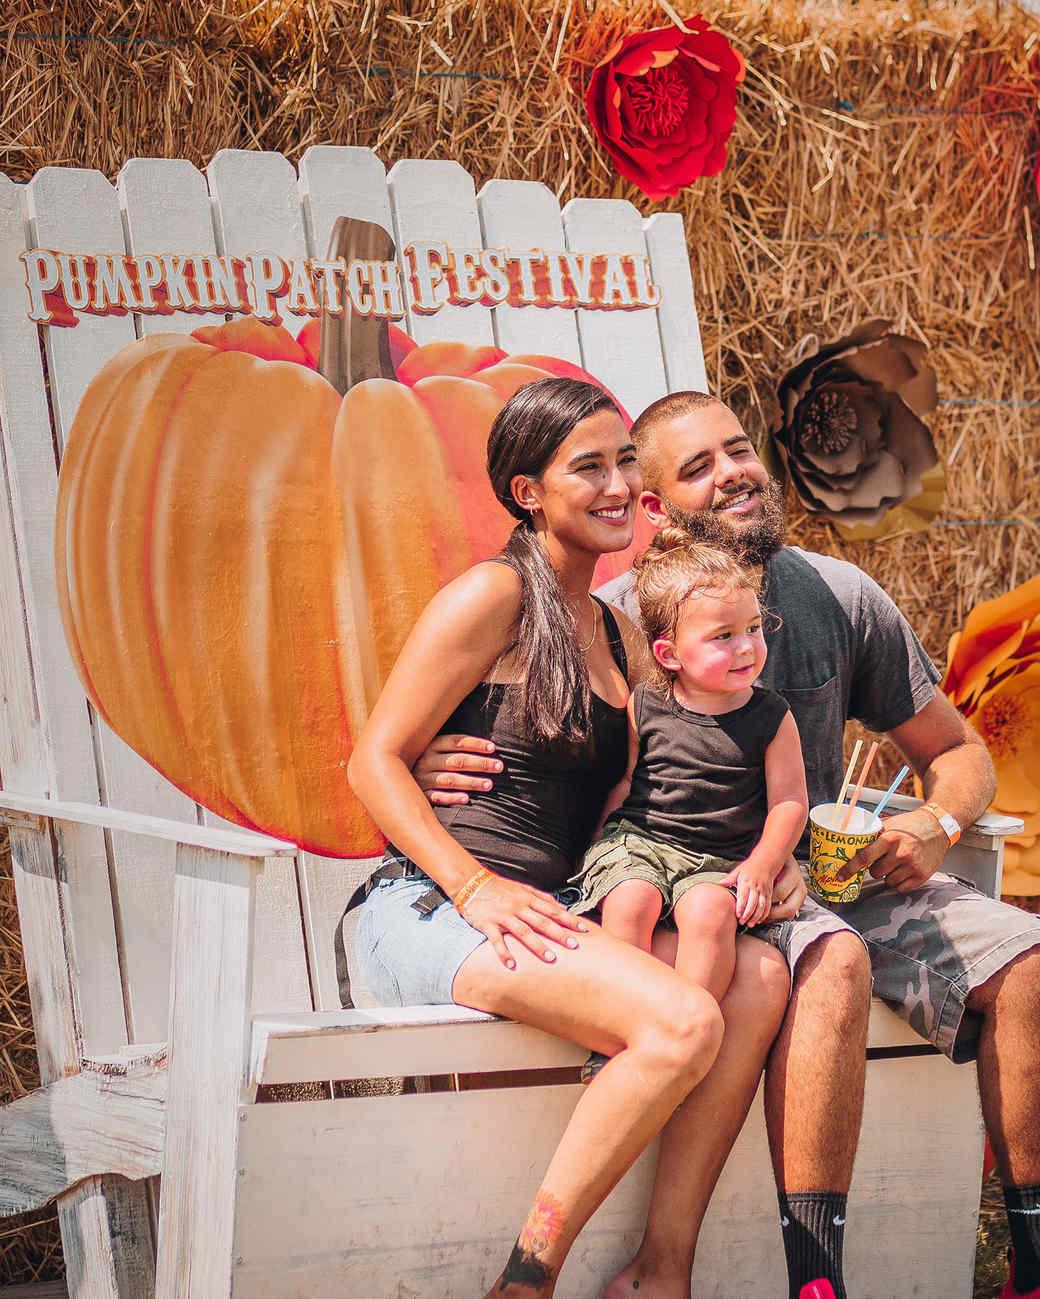 pumpkin patch festival photo set chair